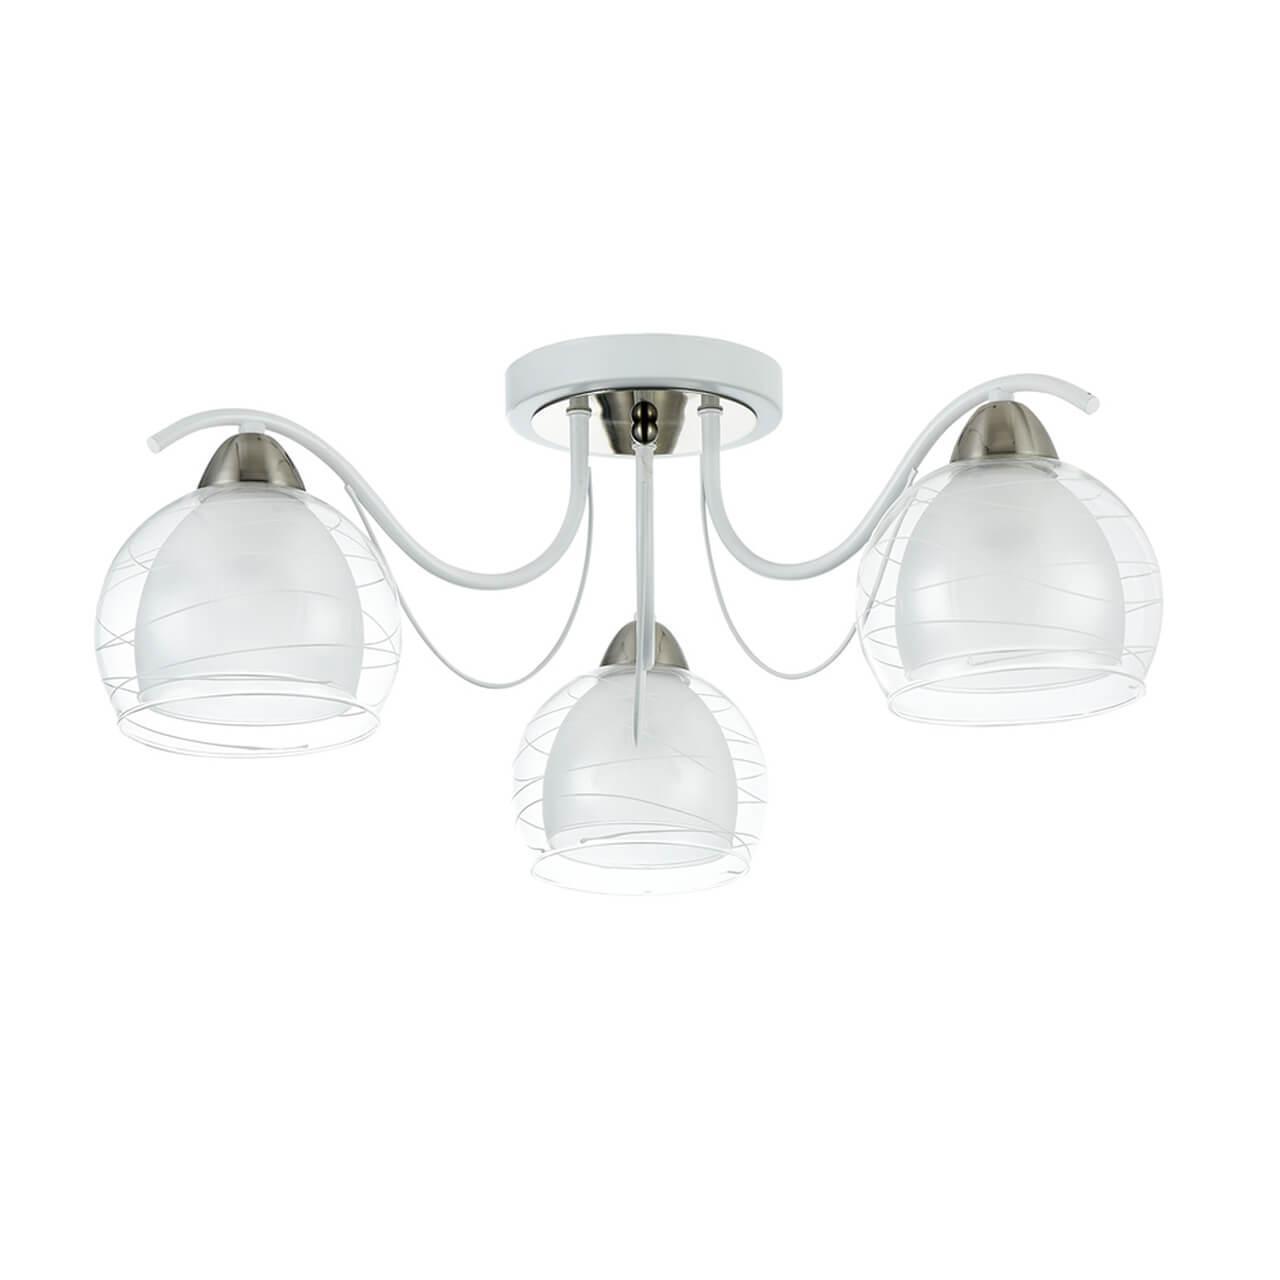 Потолочный светильник Freya FR5052-CL-03-W, E27, 60 Вт люстра freya freya fr5052 cl 08 w